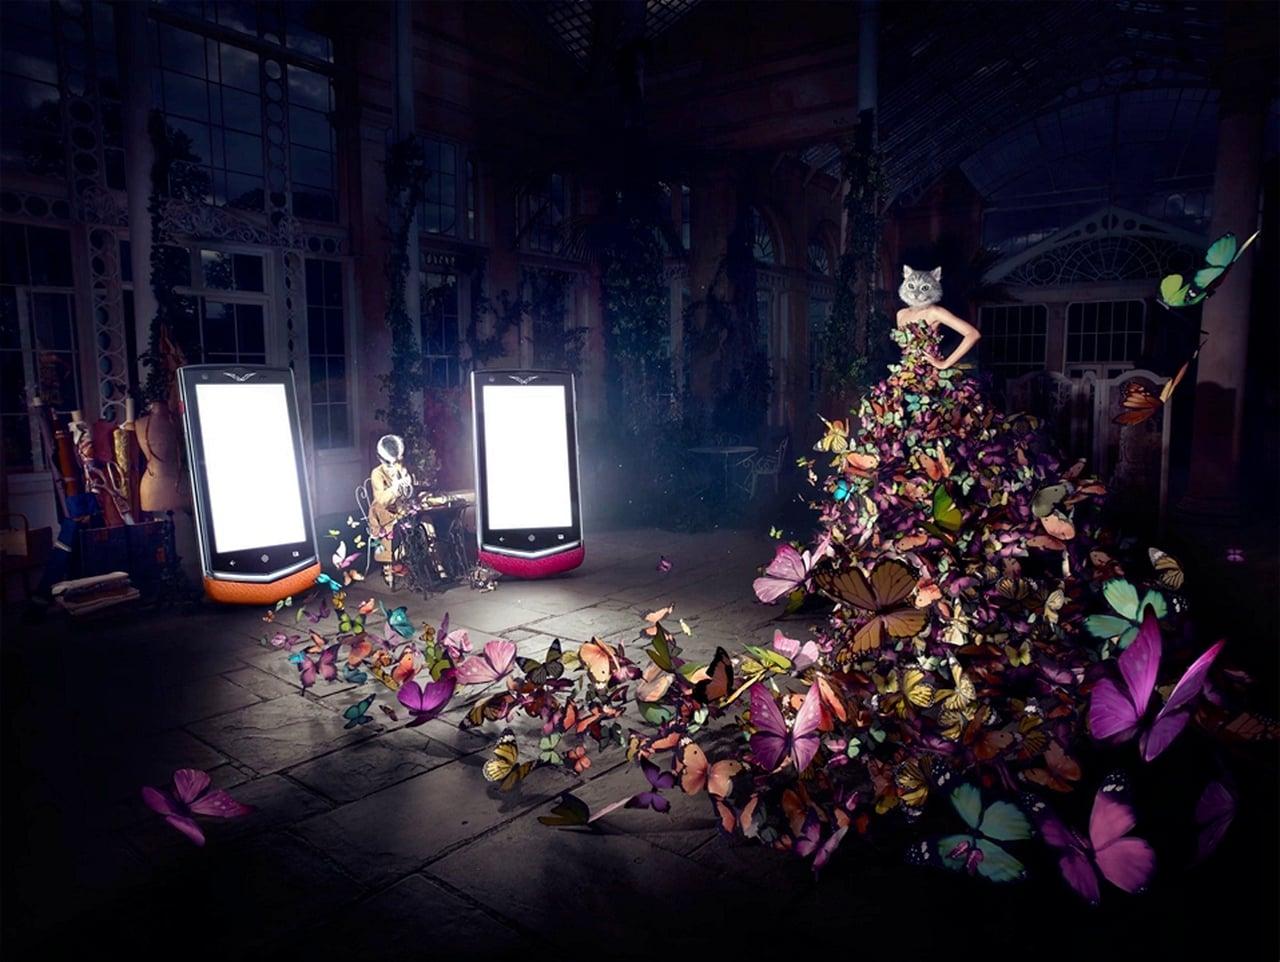 Vertu Constellation Luxury Smartphone